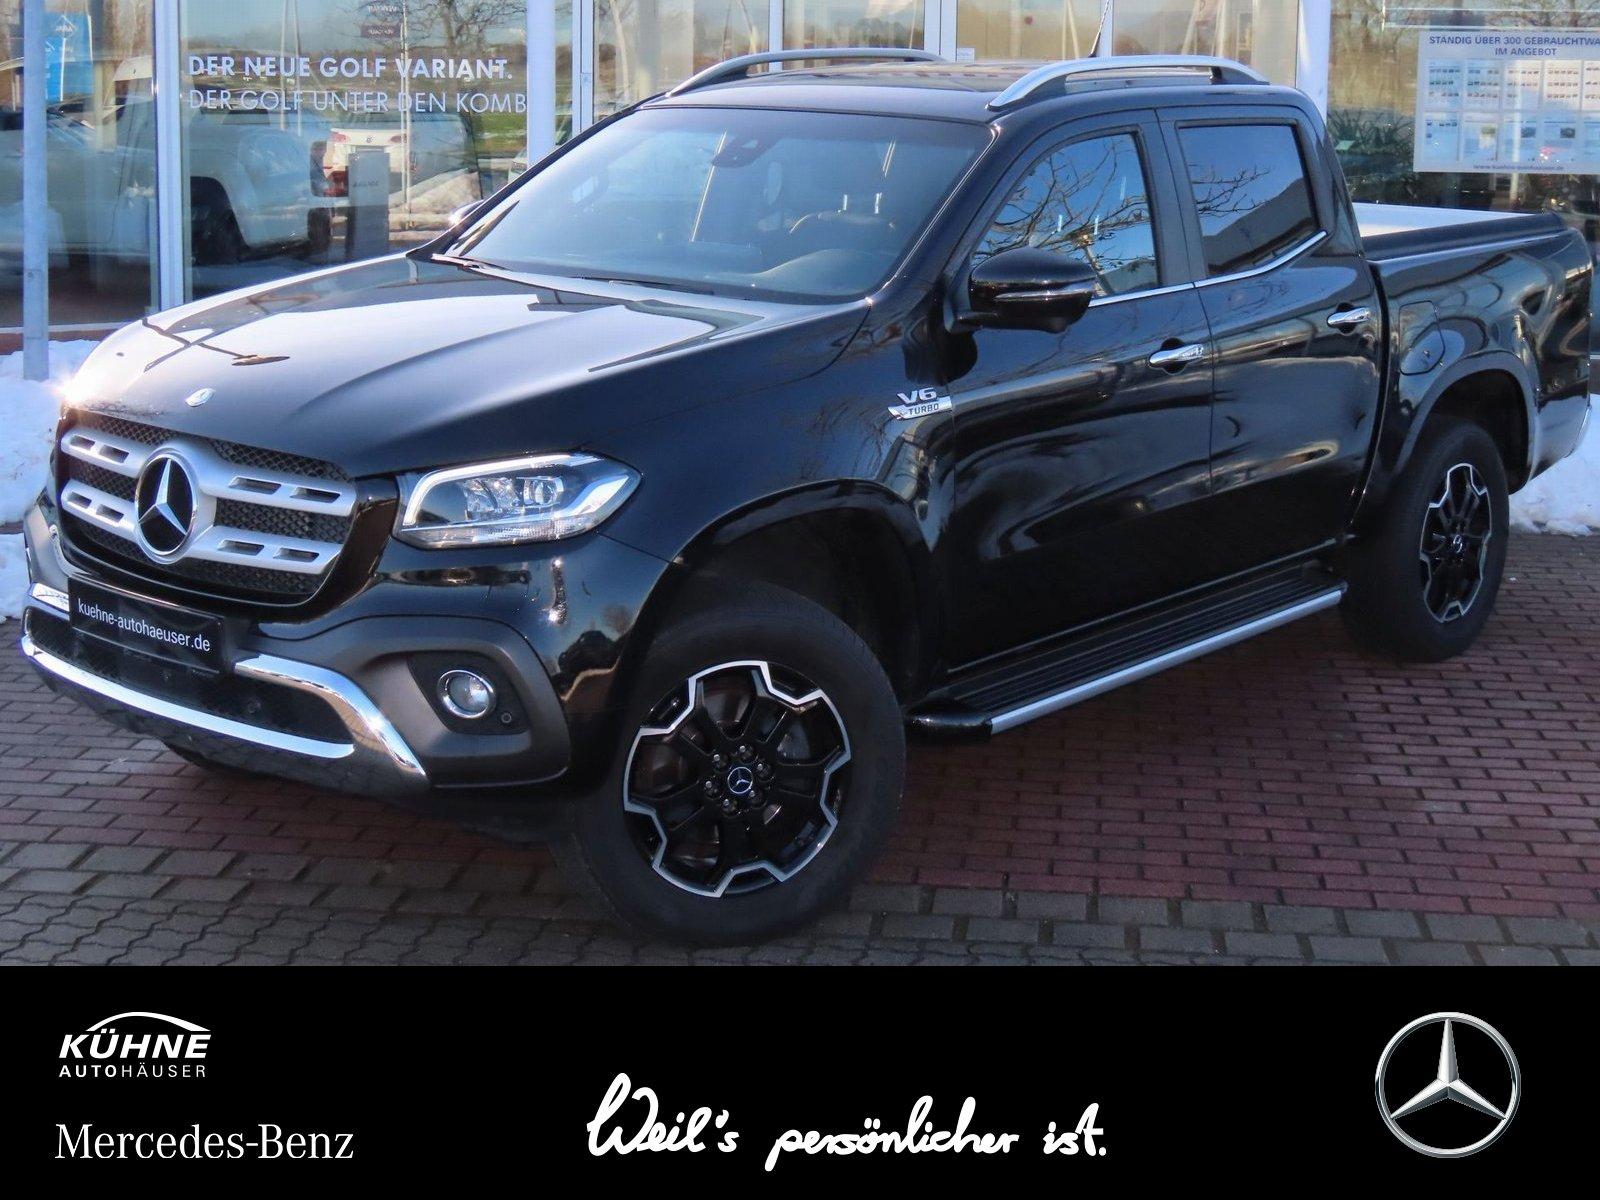 Mercedes-Benz X 350 d 4x4*Power*COM*DAB*360°*Leder*2xDiffsp*ua, Jahr 2019, Diesel